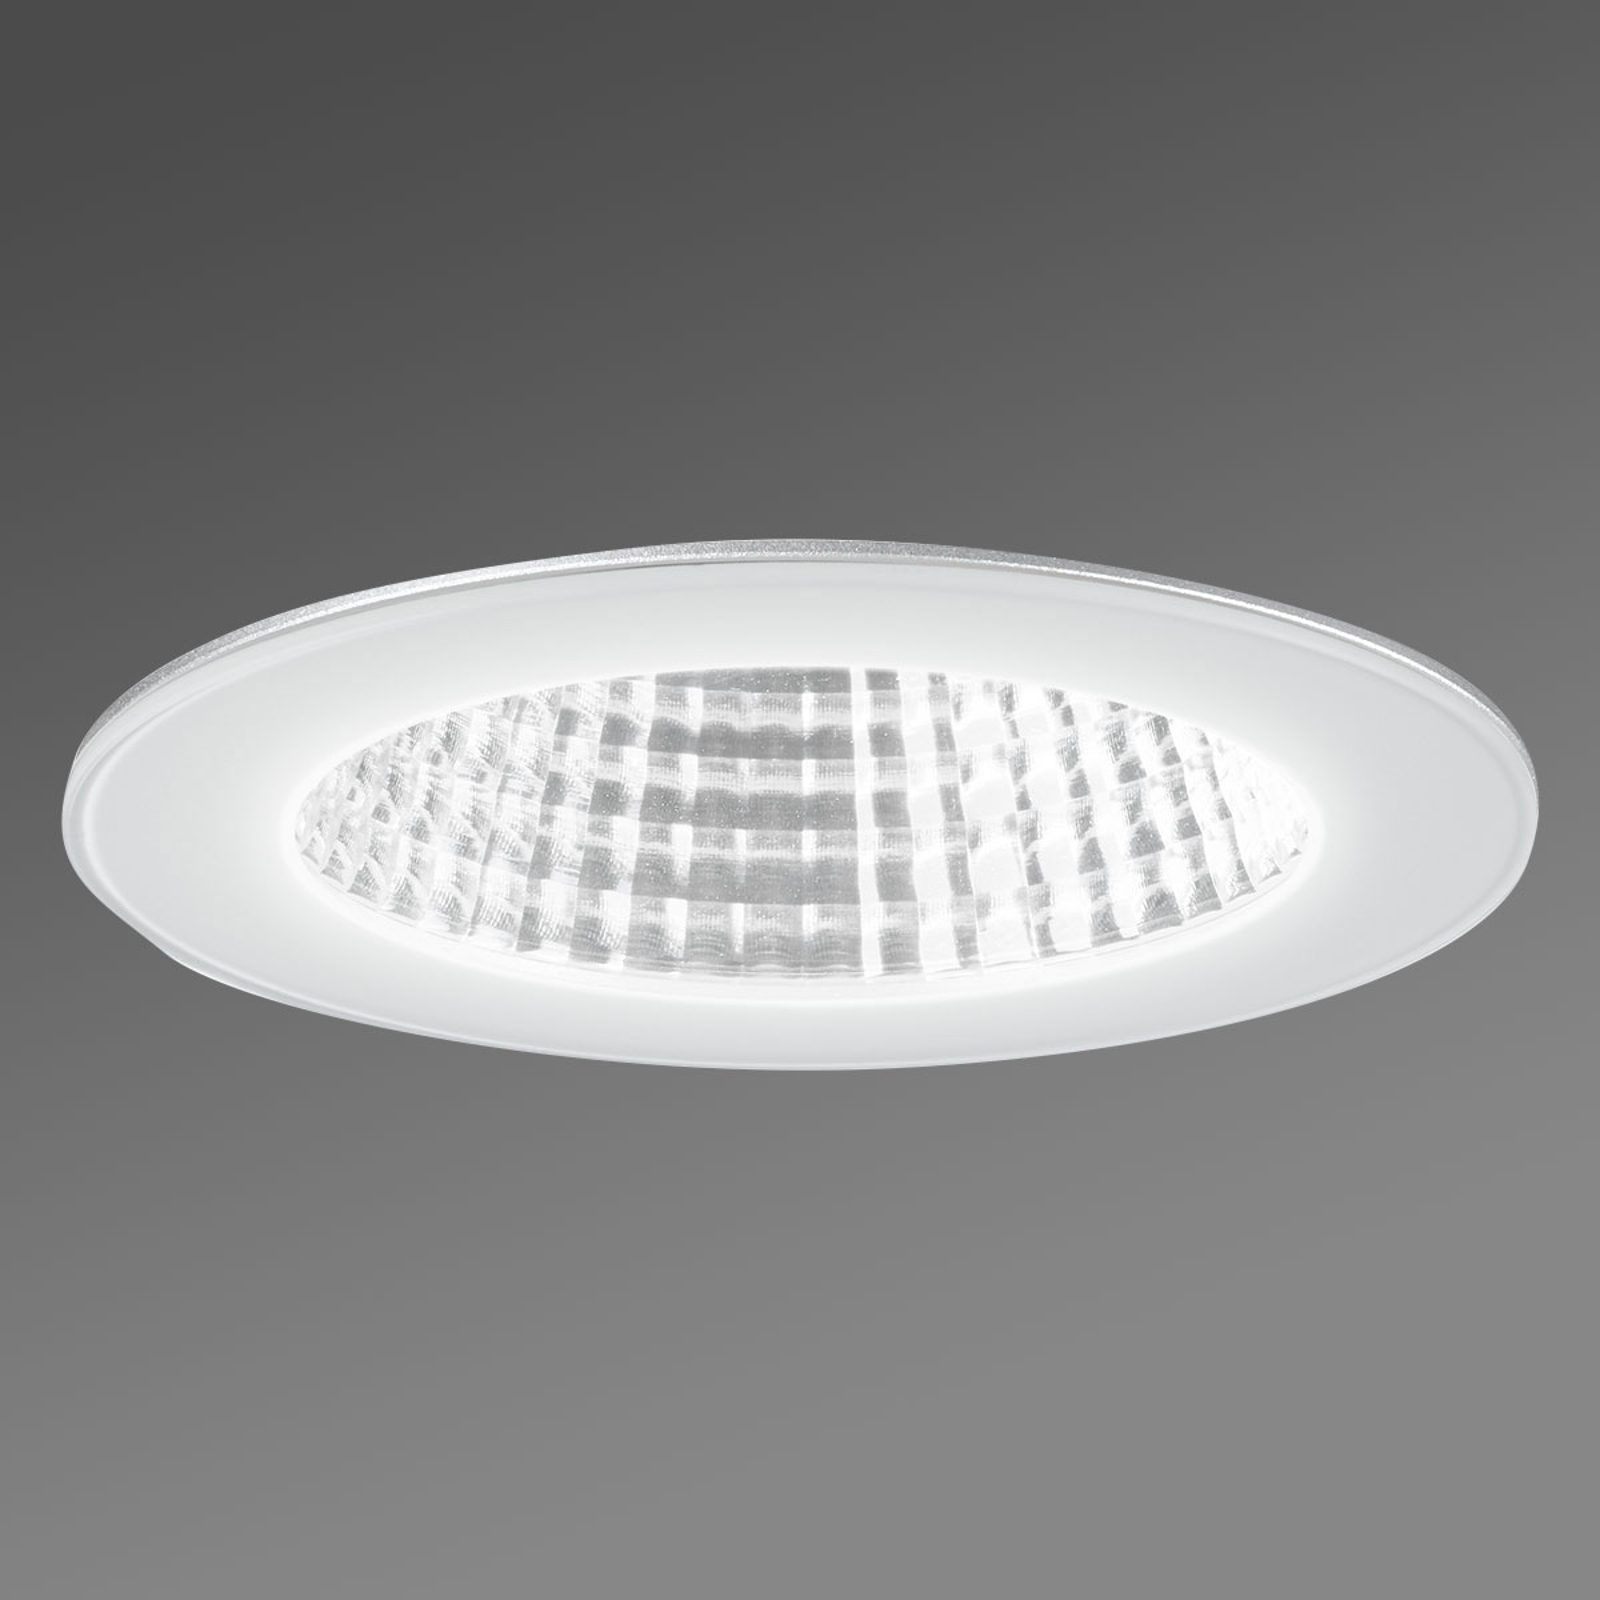 Foco empotrado LED IDown 13, a prueba de agua